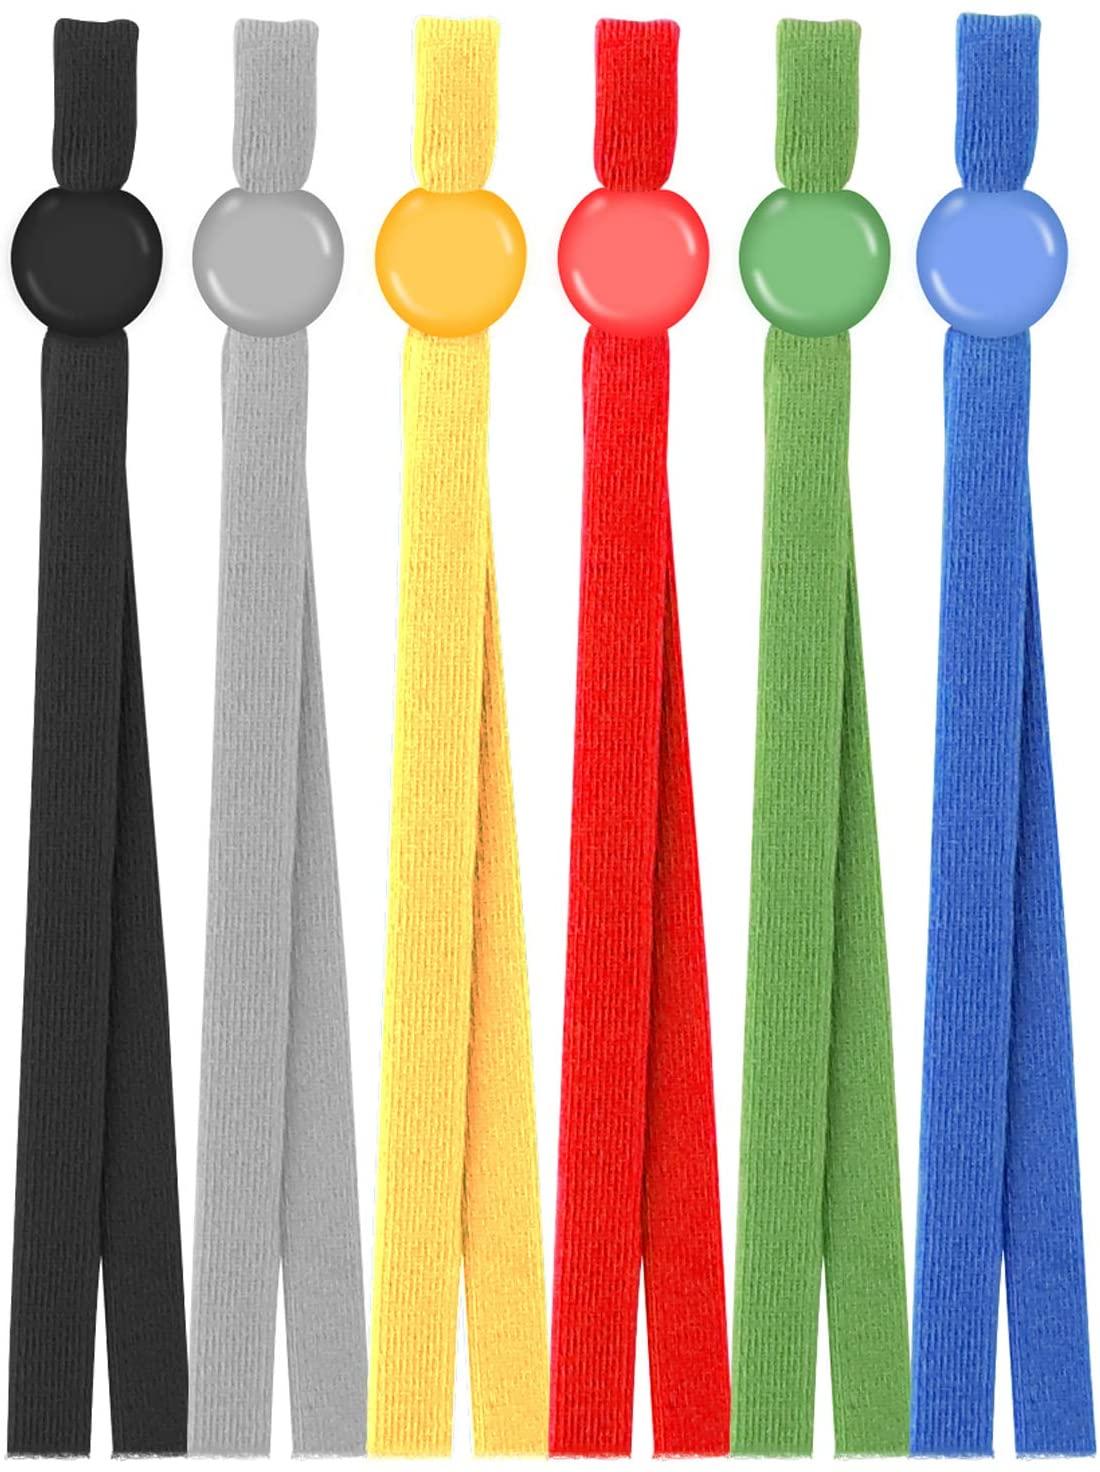 Adjustable Elastic Ear Loops for Mask for Adult/Children, Elastic String for DIY Making with Adjustment Buckles (Multicolour1-120)